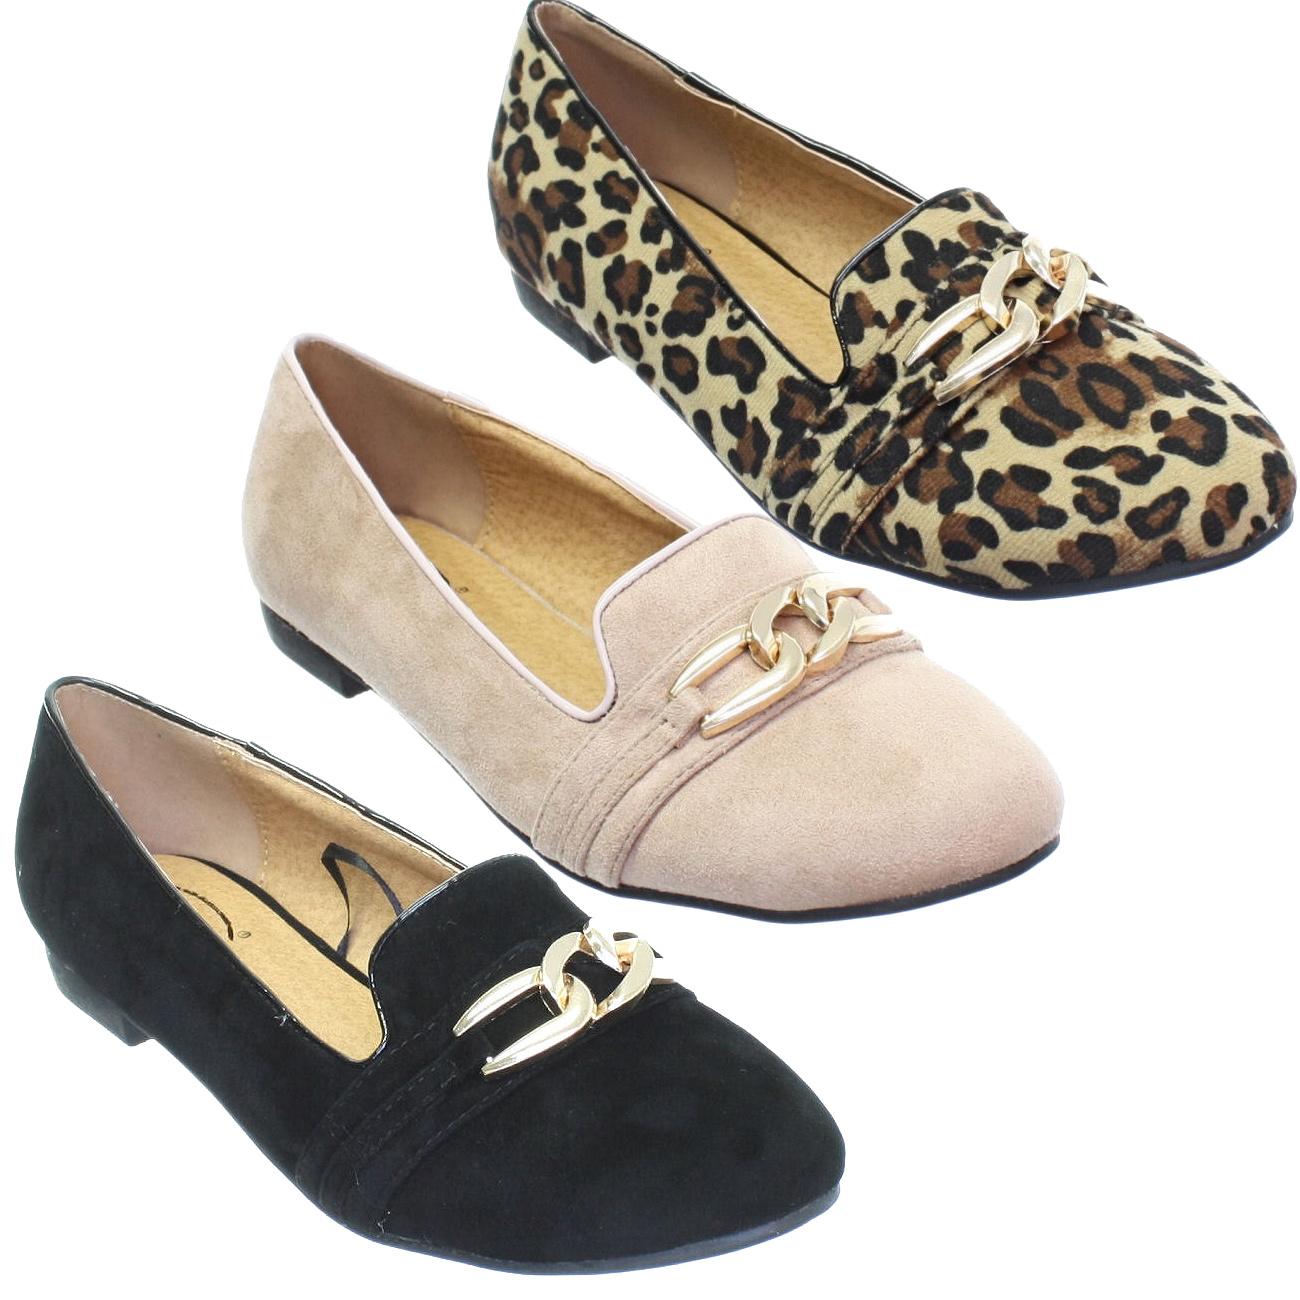 chaussure plat style mocassin femme interlinked boucle dore elegant 36 41. Black Bedroom Furniture Sets. Home Design Ideas